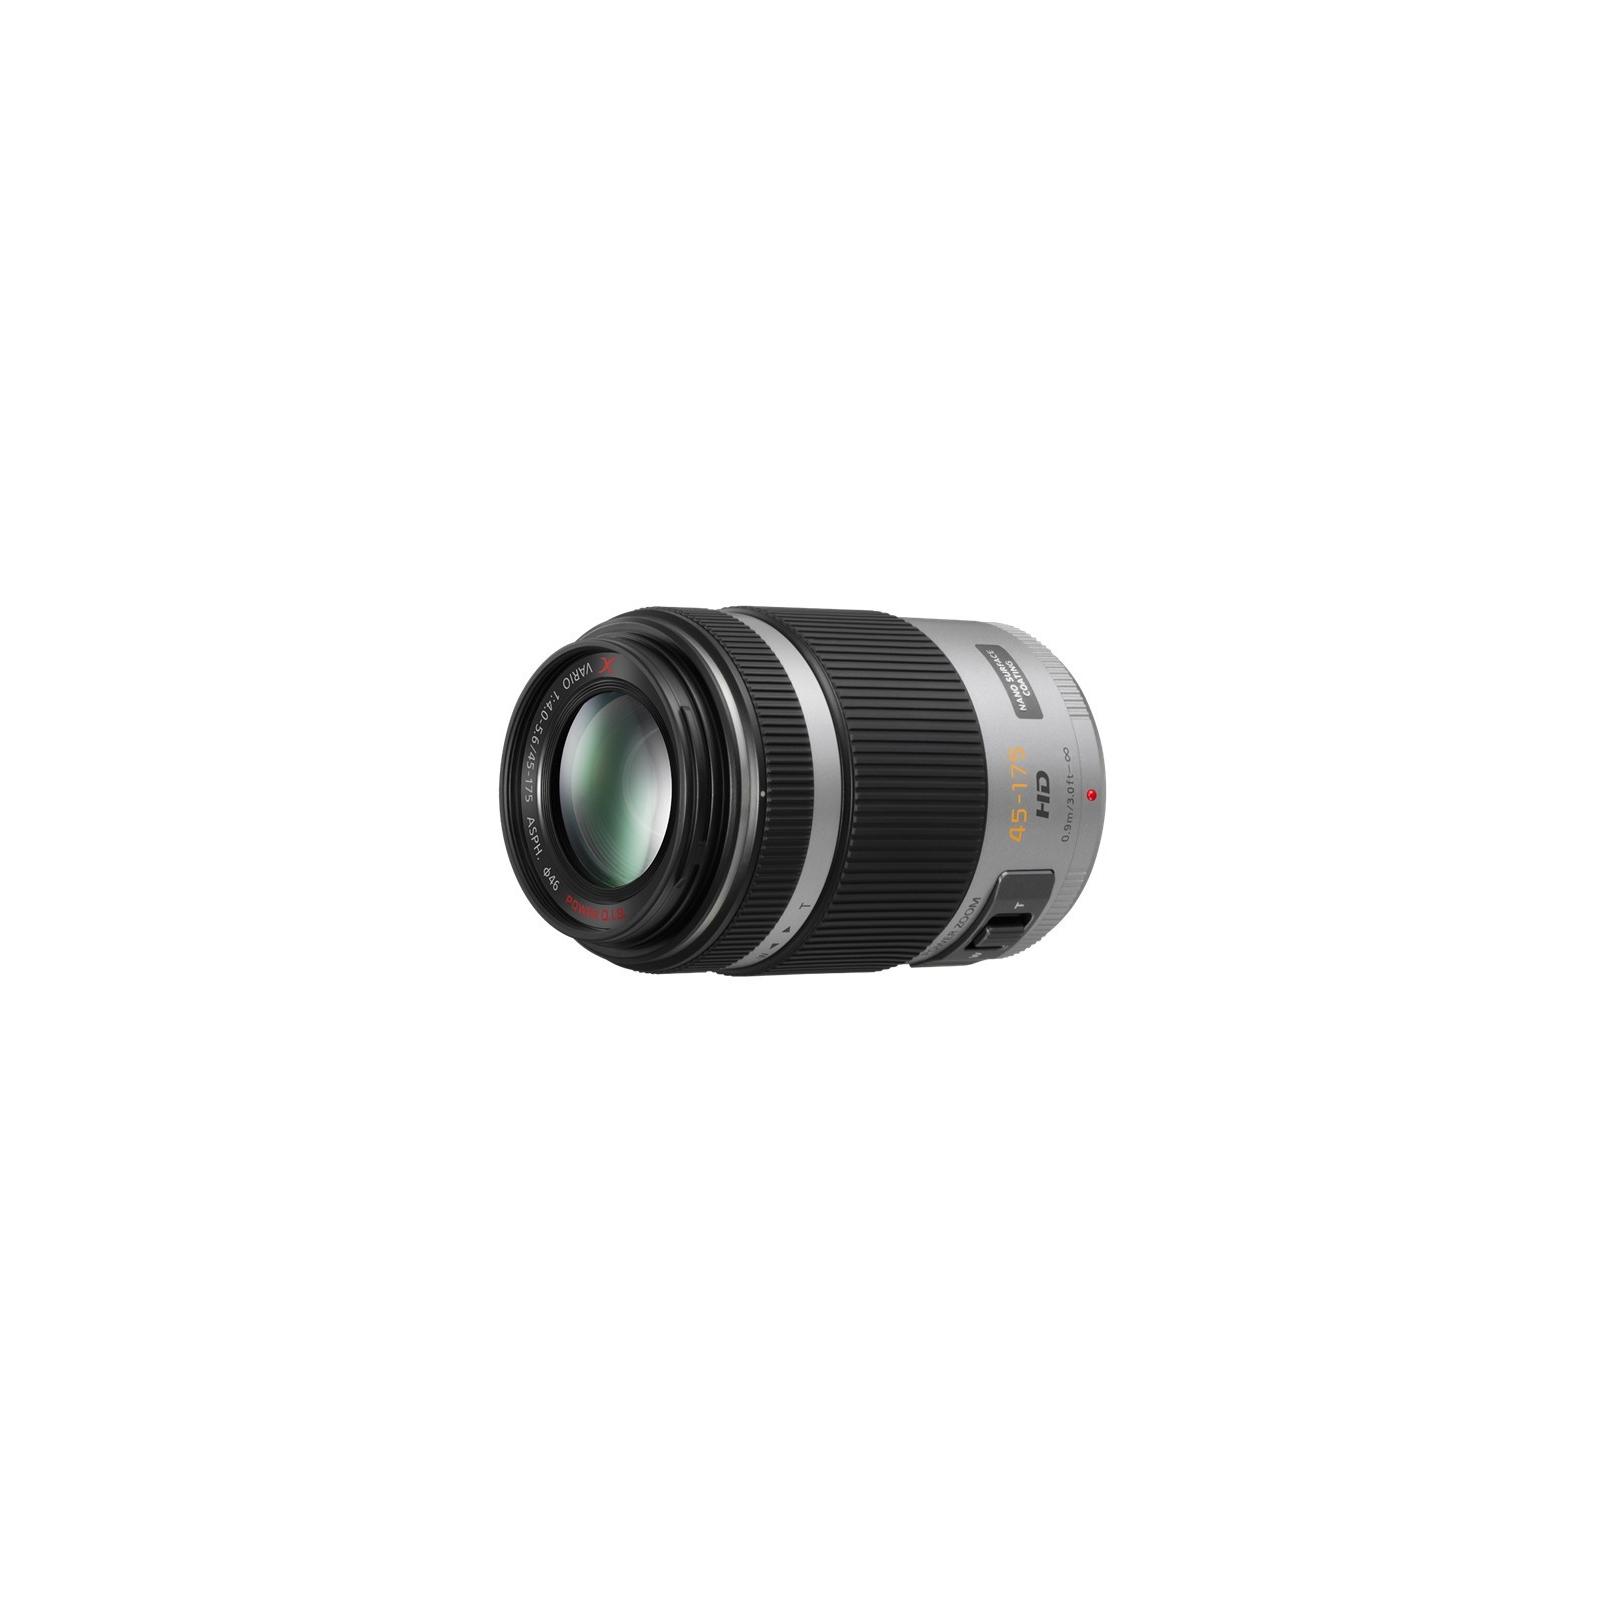 Объектив PANASONIC Micro 4/3 Lens 45-175 mm F4-5.6 Silver (H-PS45175E-S) изображение 3